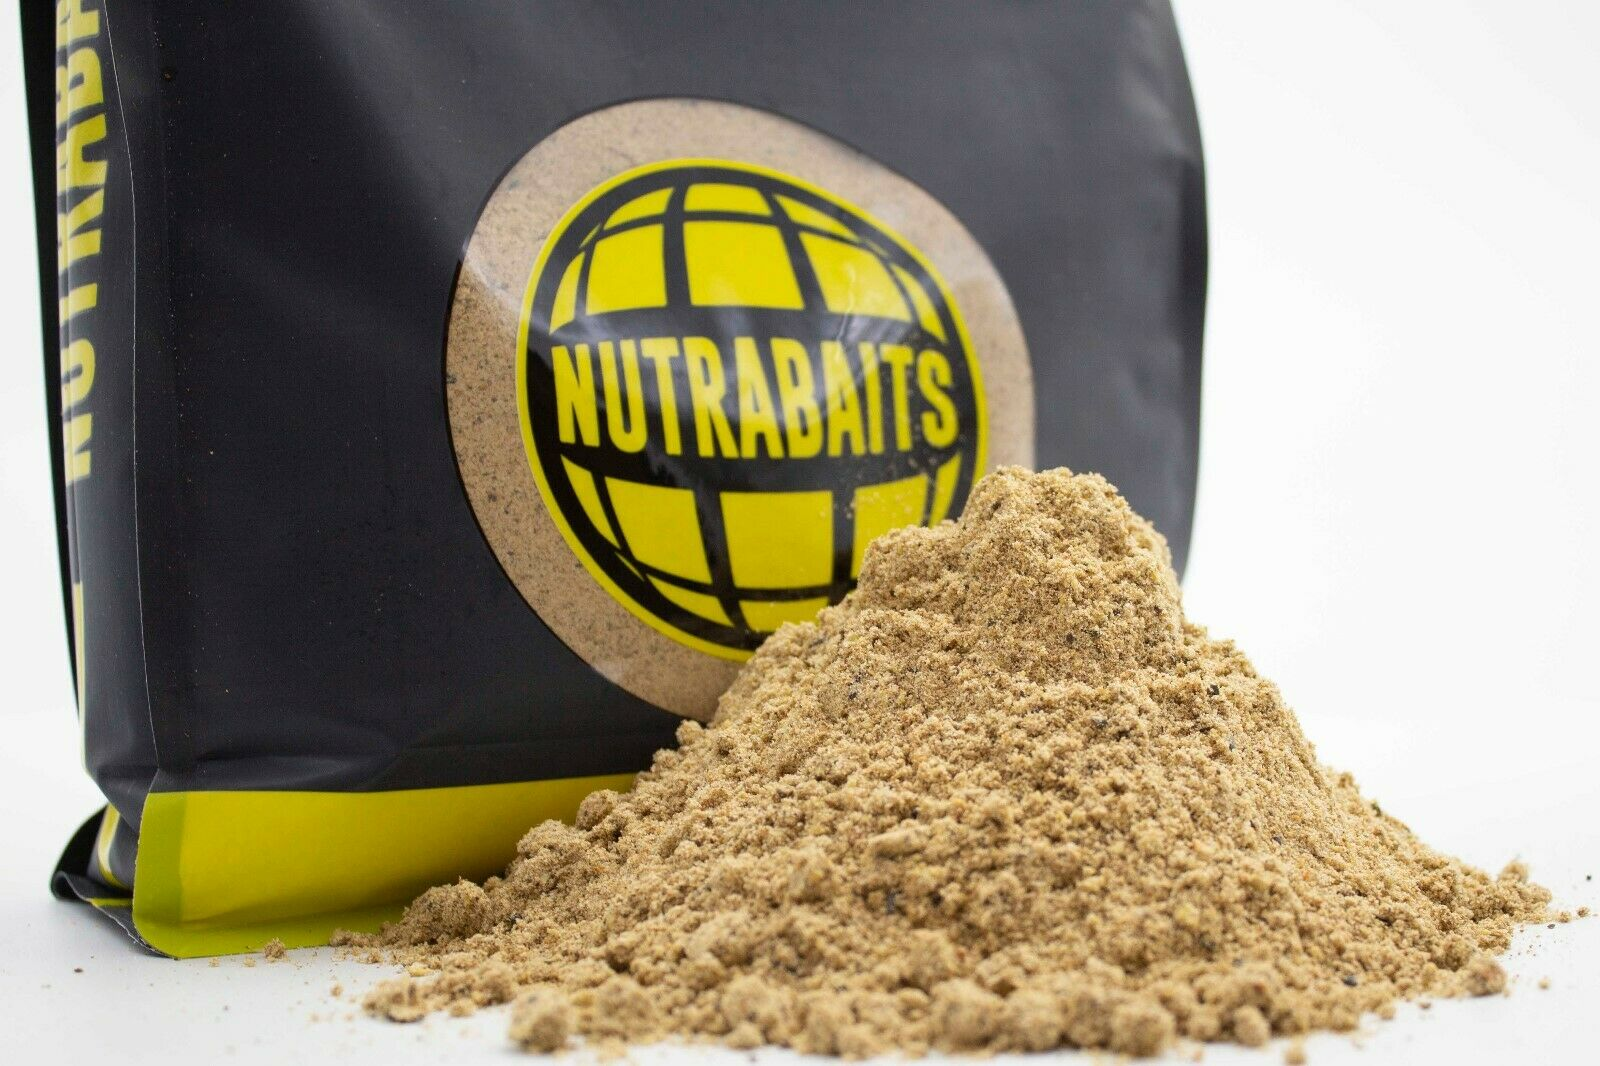 Nutrabaits Base mix 1.5kg Boilie making ingredient Carp fishing ALL VARIETIES